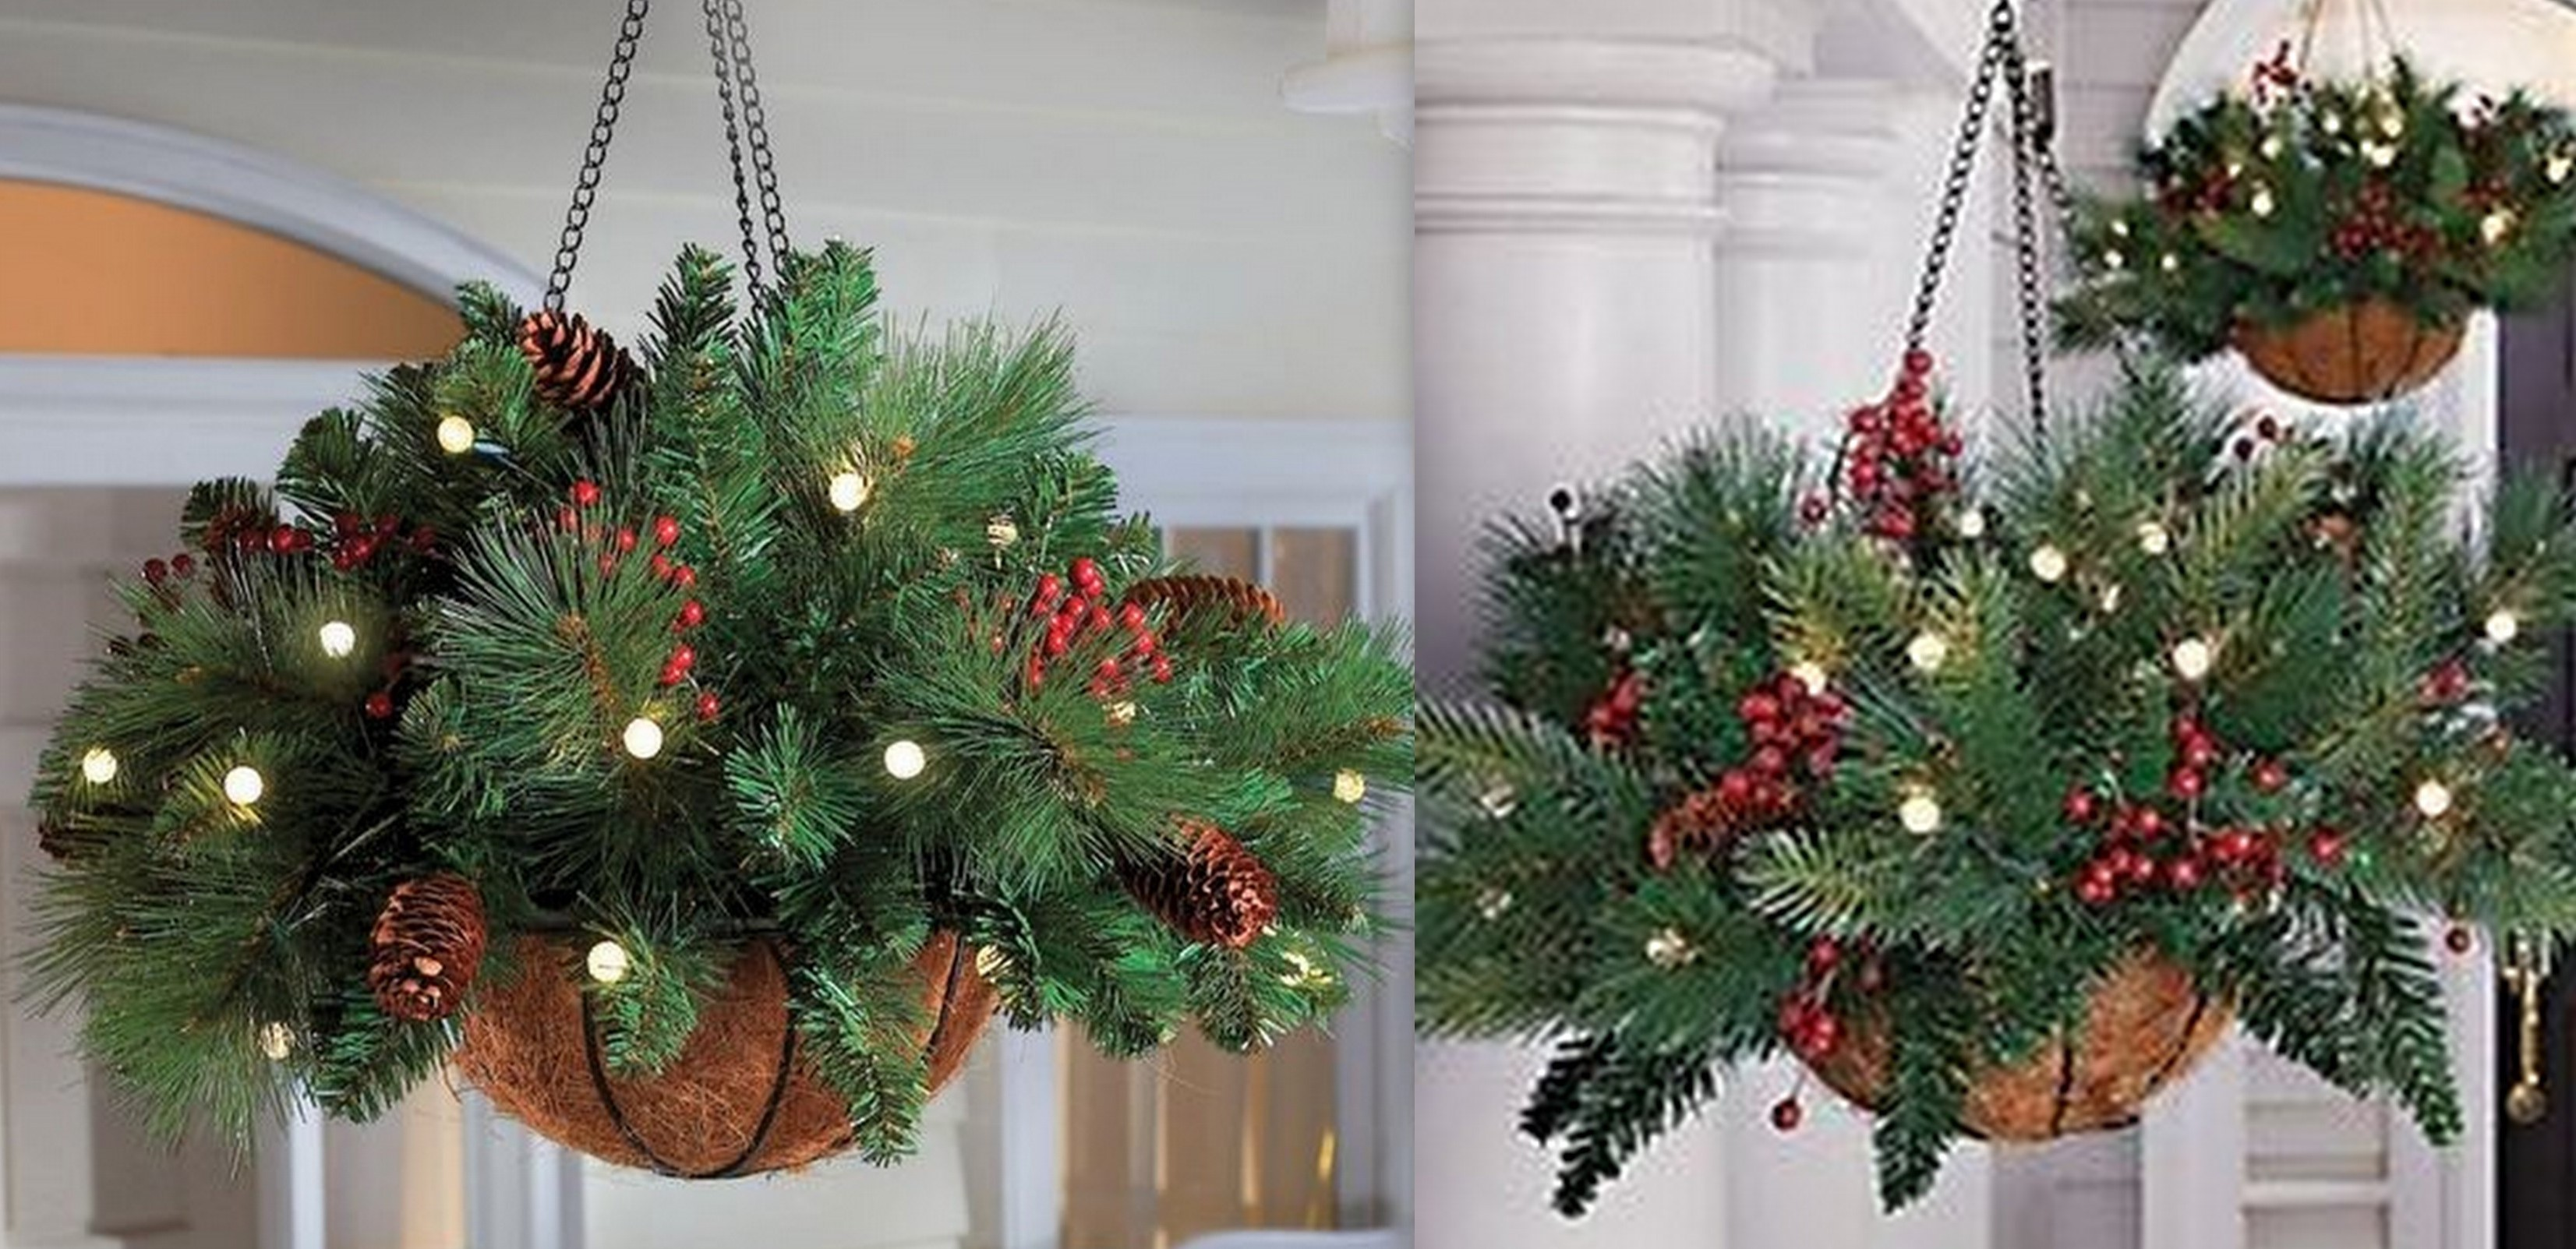 #6F3E2E Décorations De Noël En Tiges Et Branches De Sapin Page 2 5409 decorations de noel en gros 3305x1603 px @ aertt.com